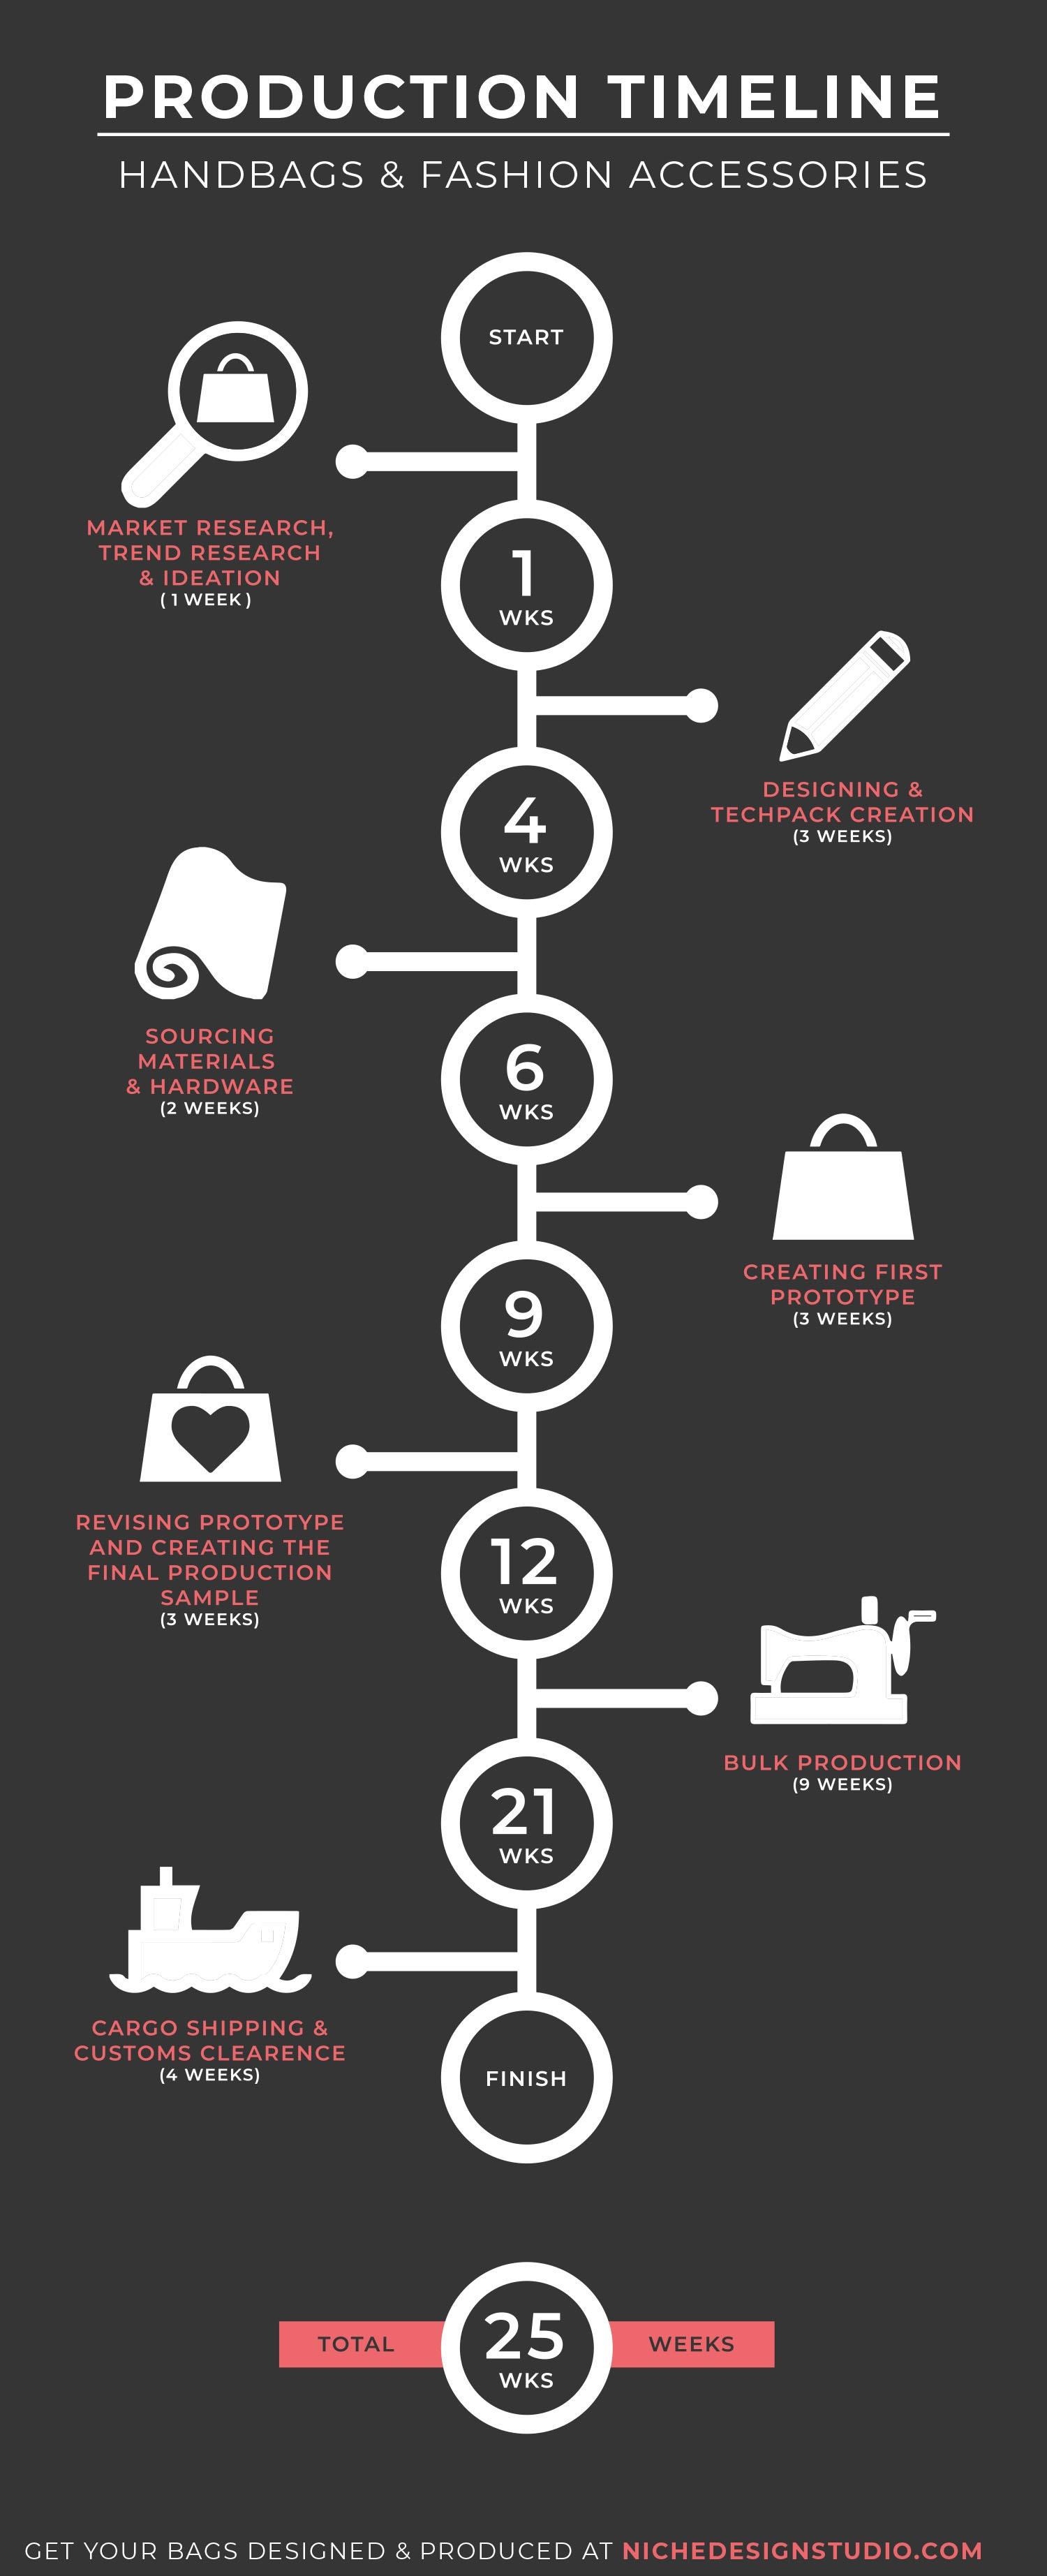 1aceaf02ea Where can I buy wholesale clothing online (dropship handbags ...